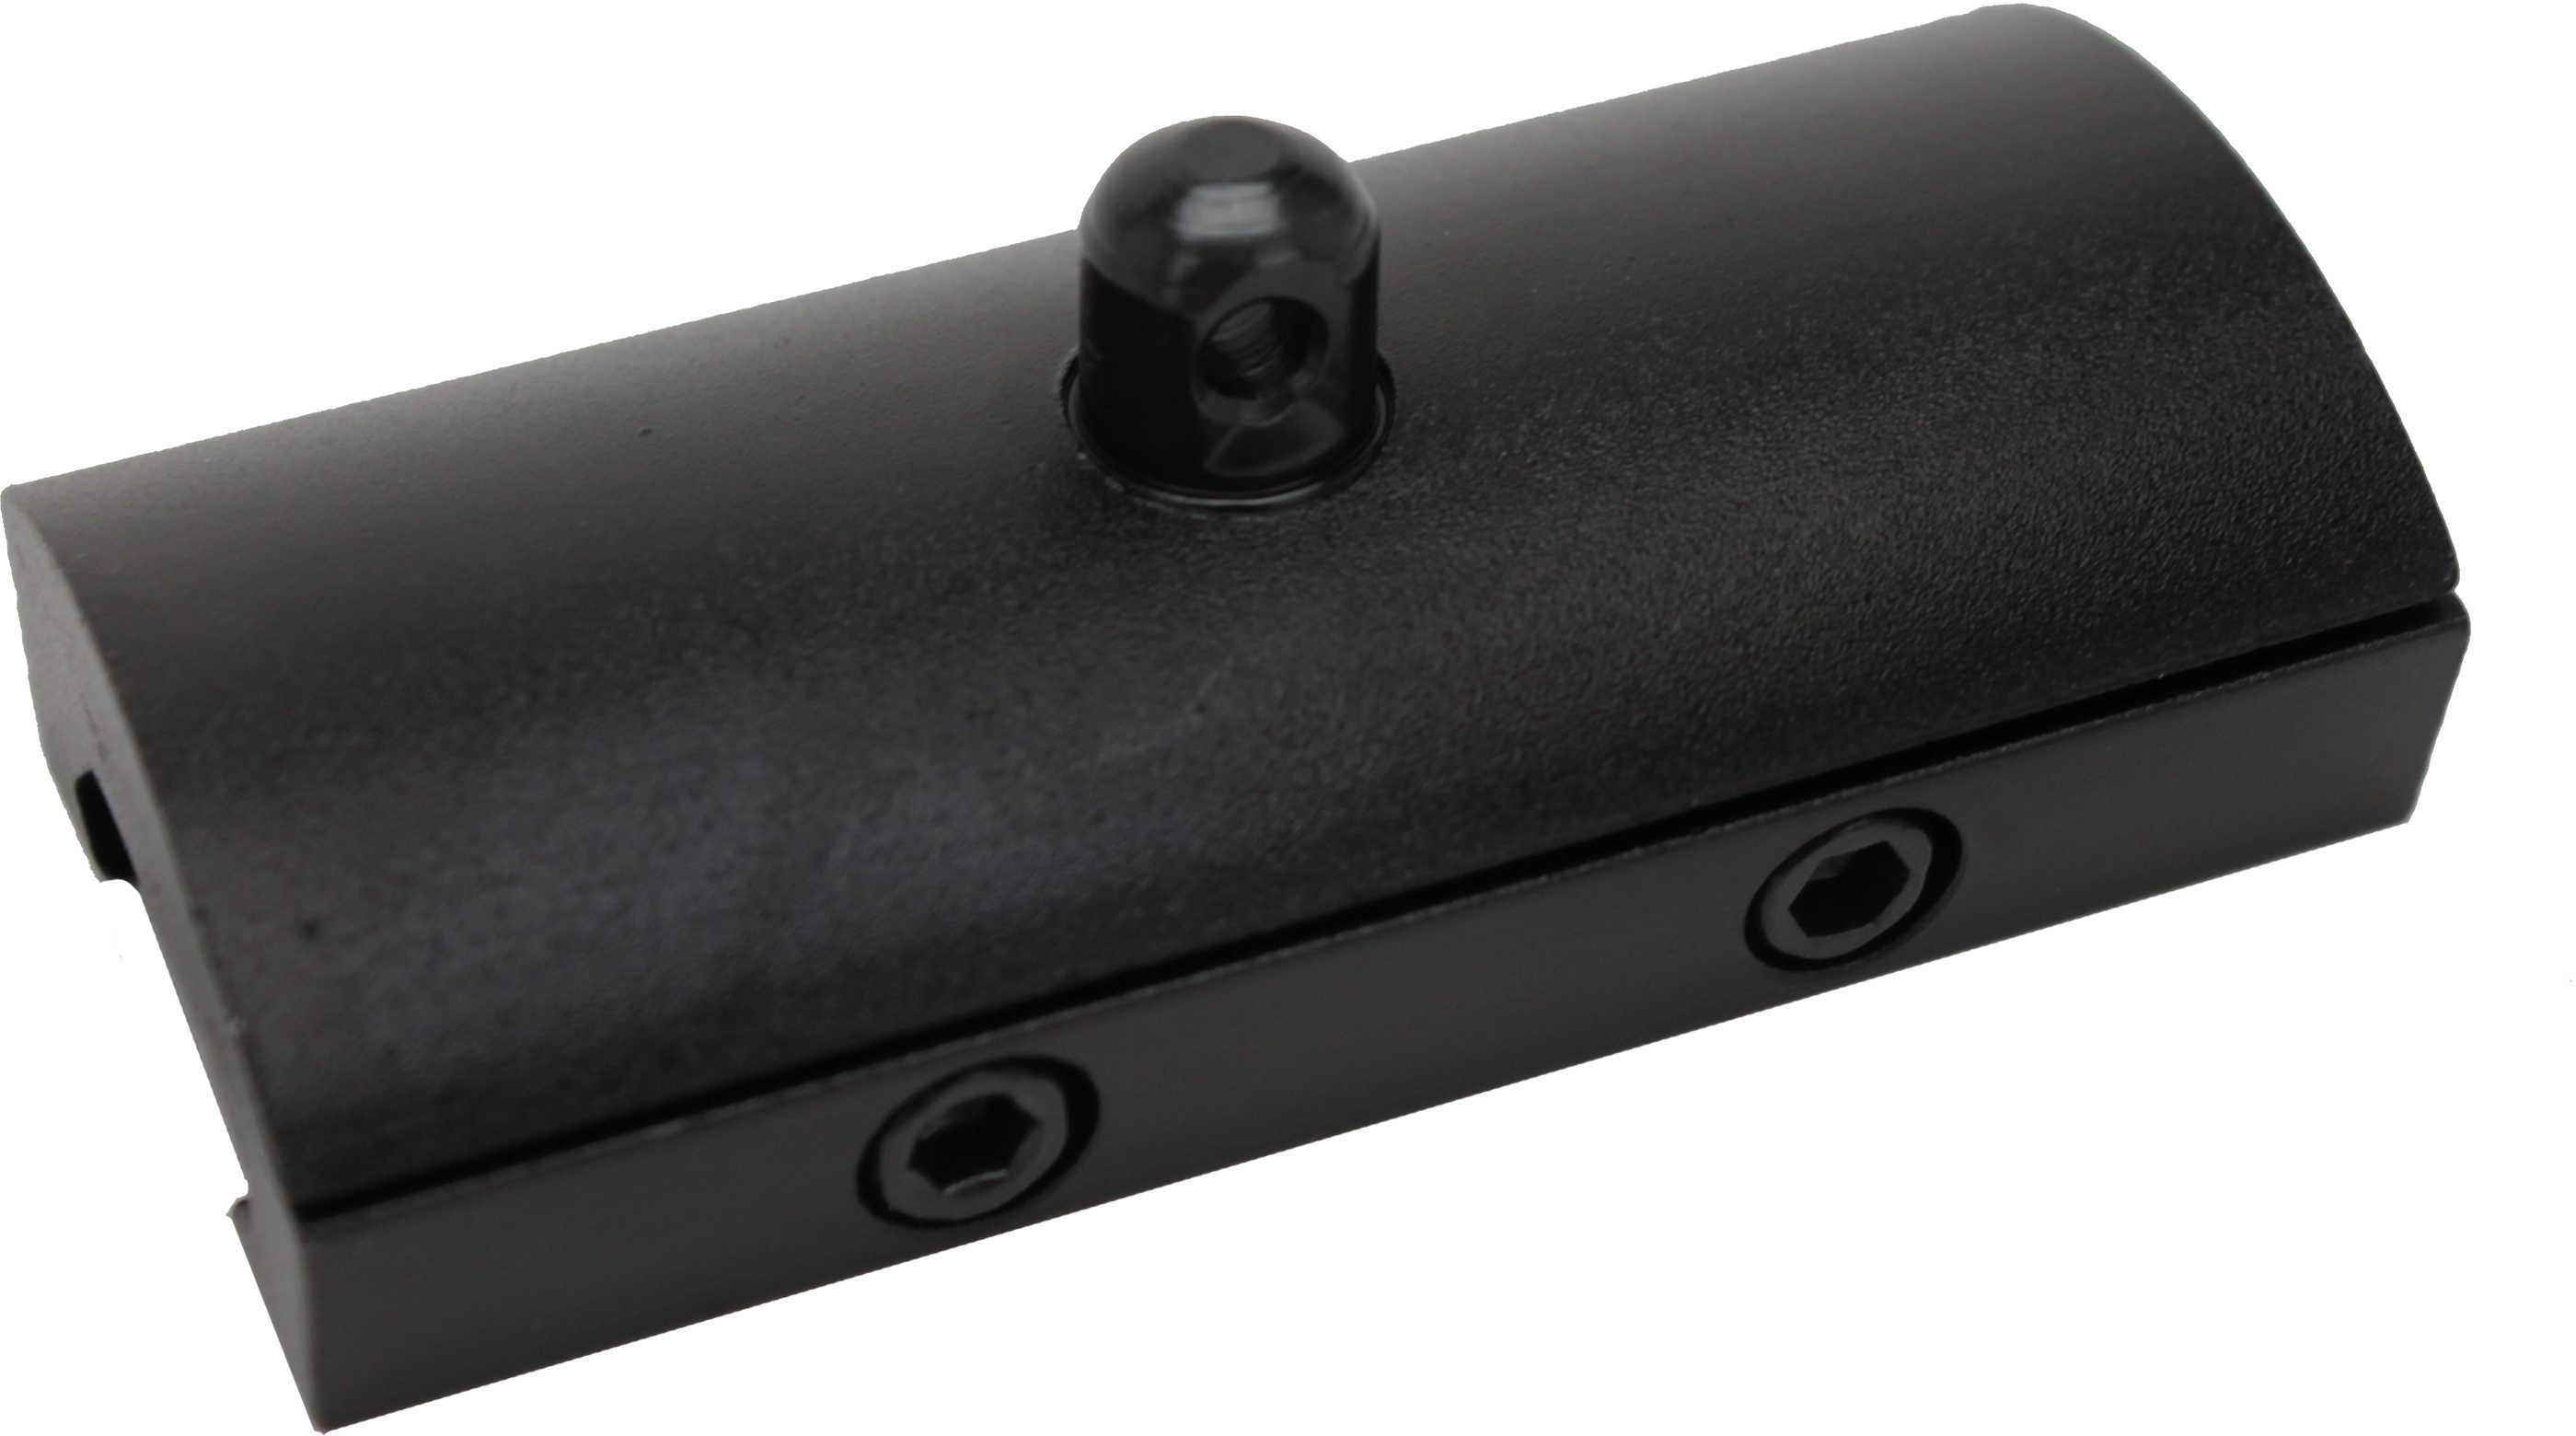 Caldwell Bipod Adaptor For PIC Rail 535423